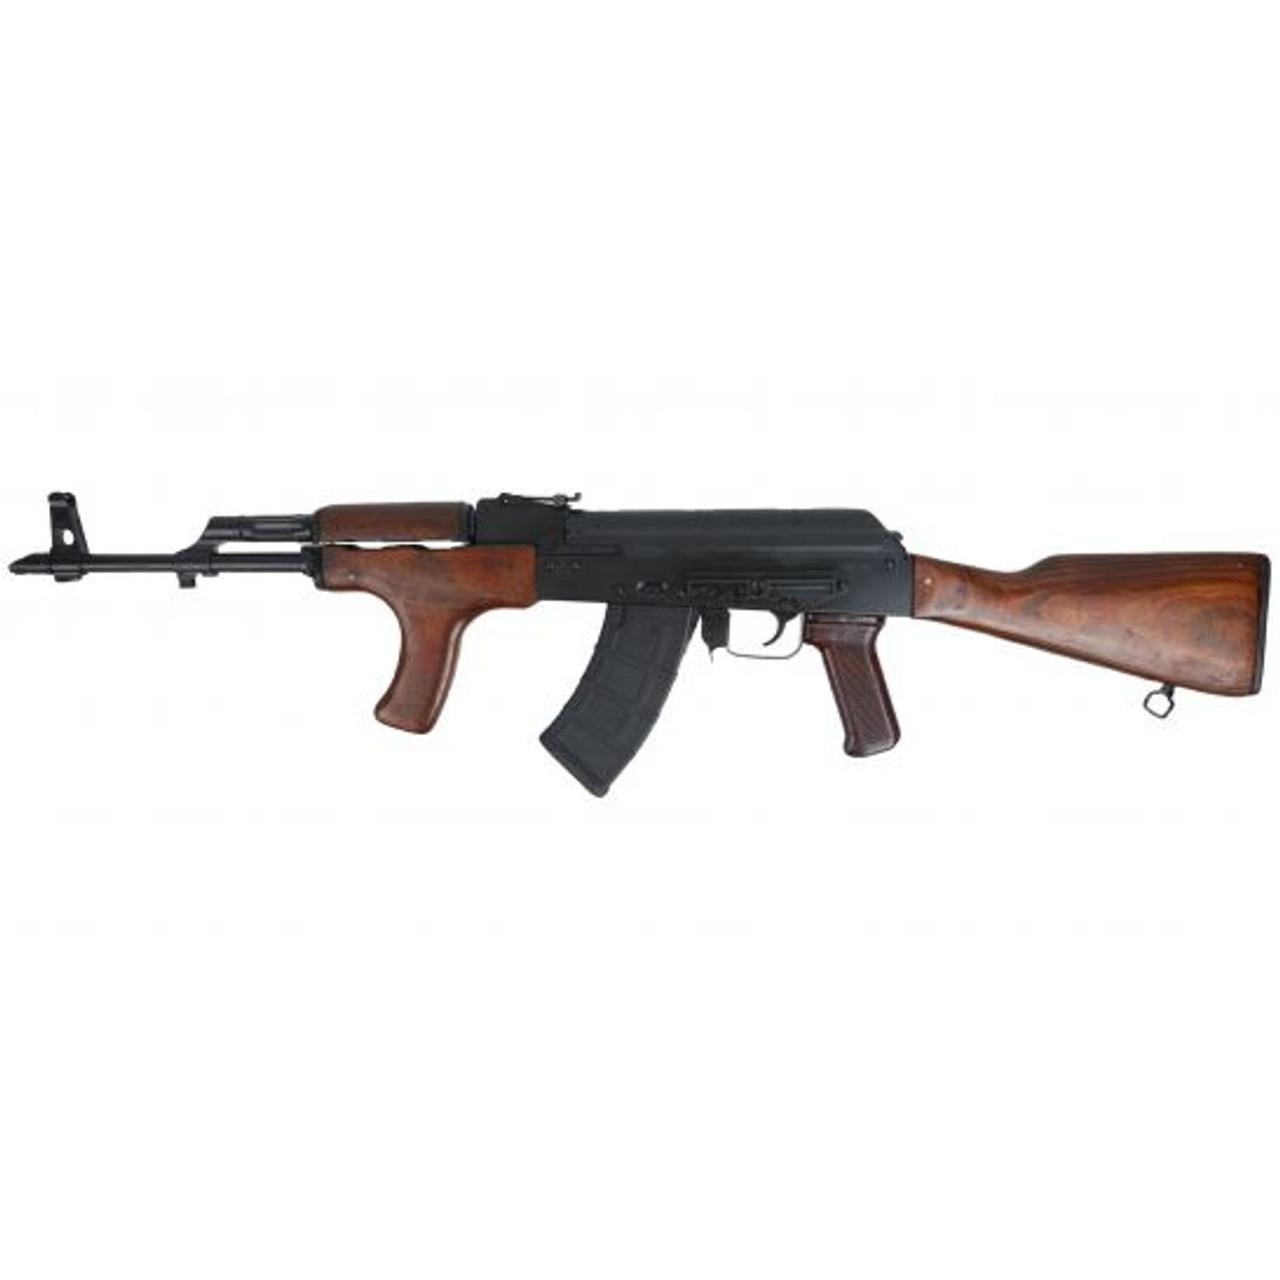 Palmetto State Armory PSAK-47 GF3-R CALIFORNIA LEGAL - 7.62x39 - Black/Brown